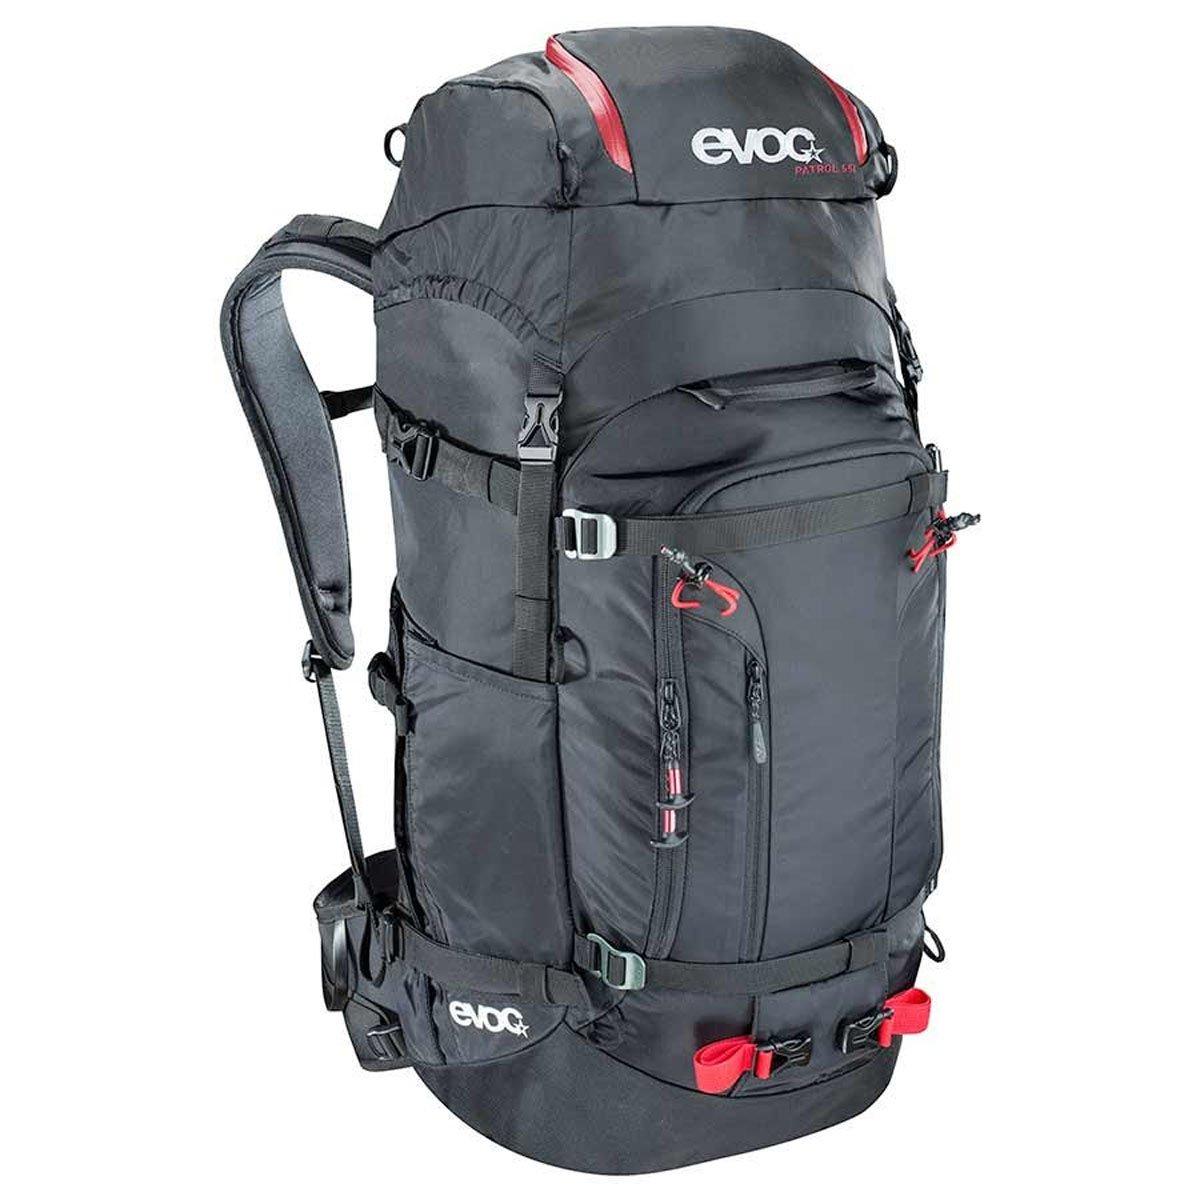 Evoc Patrolバックパック – 3356 cu inブラック, Oneサイズ   B01LQTO252